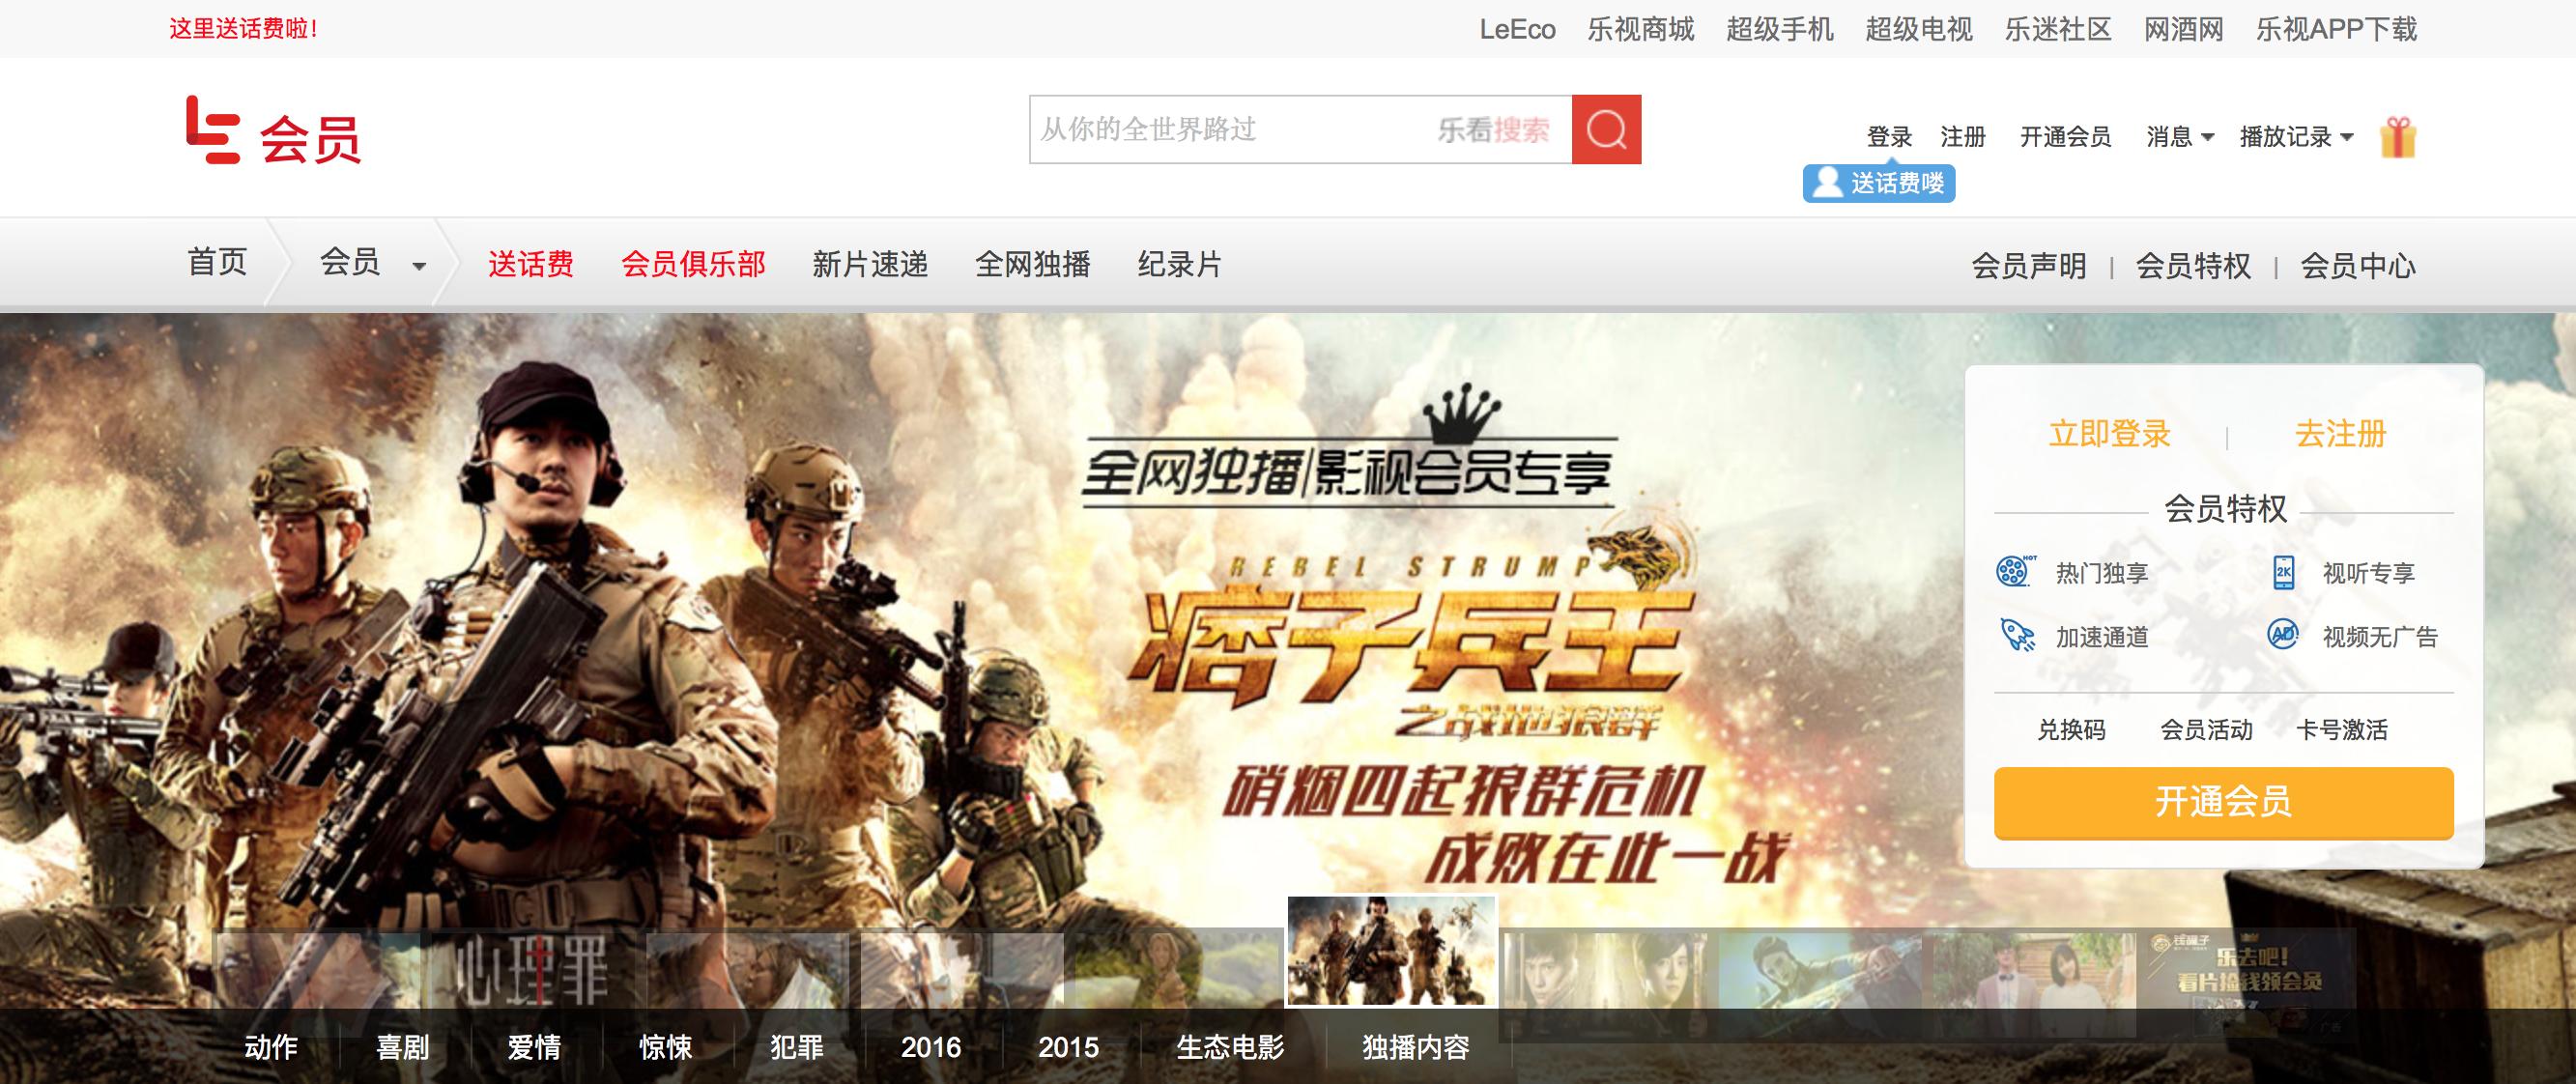 会员频道banner